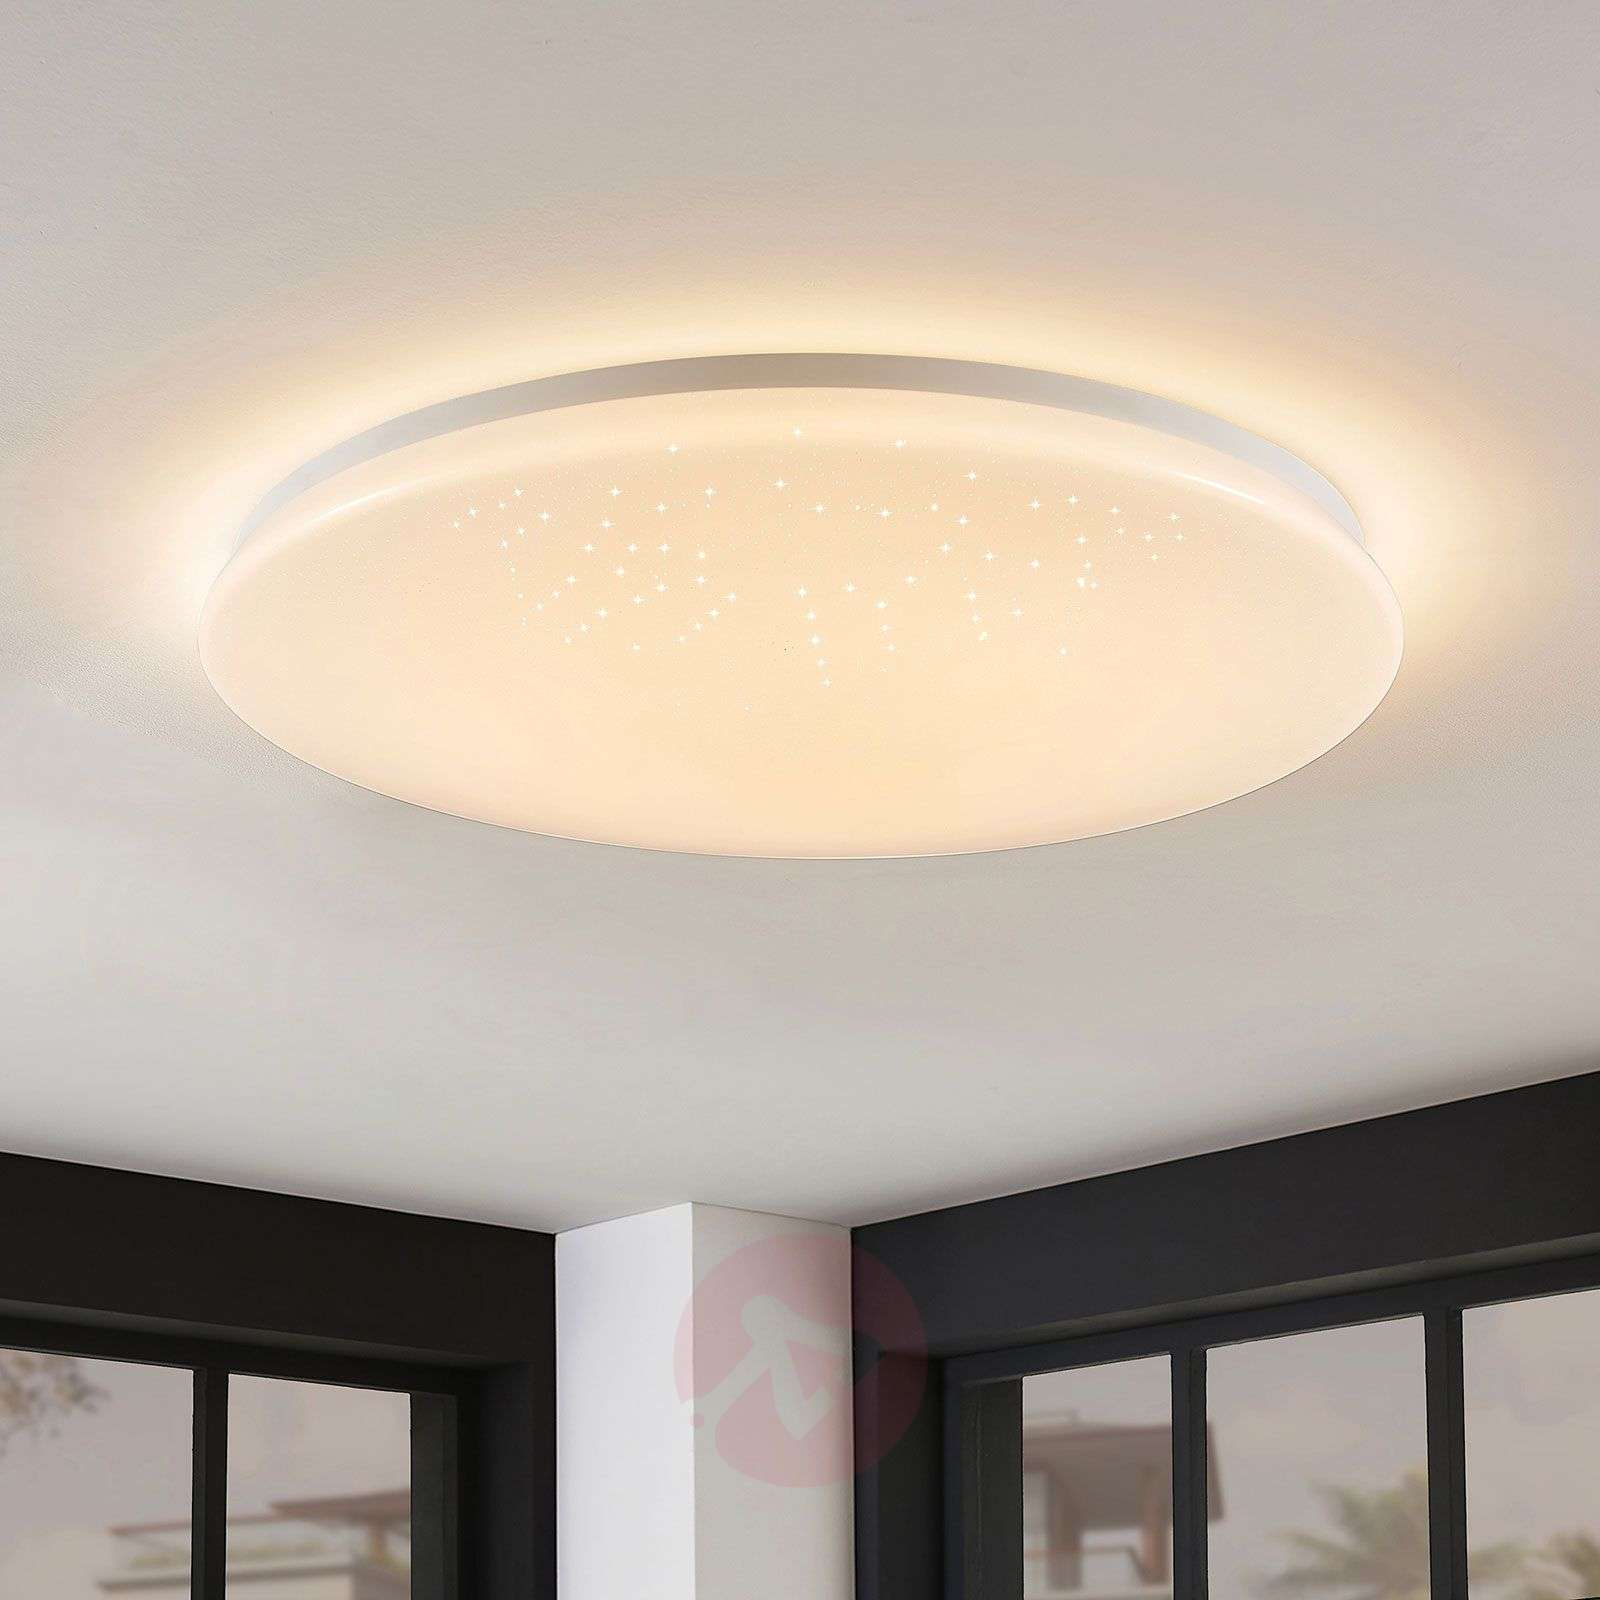 LED-kattolamppu Marlie, WiZ-teknologia, pyöreä-8032183-02